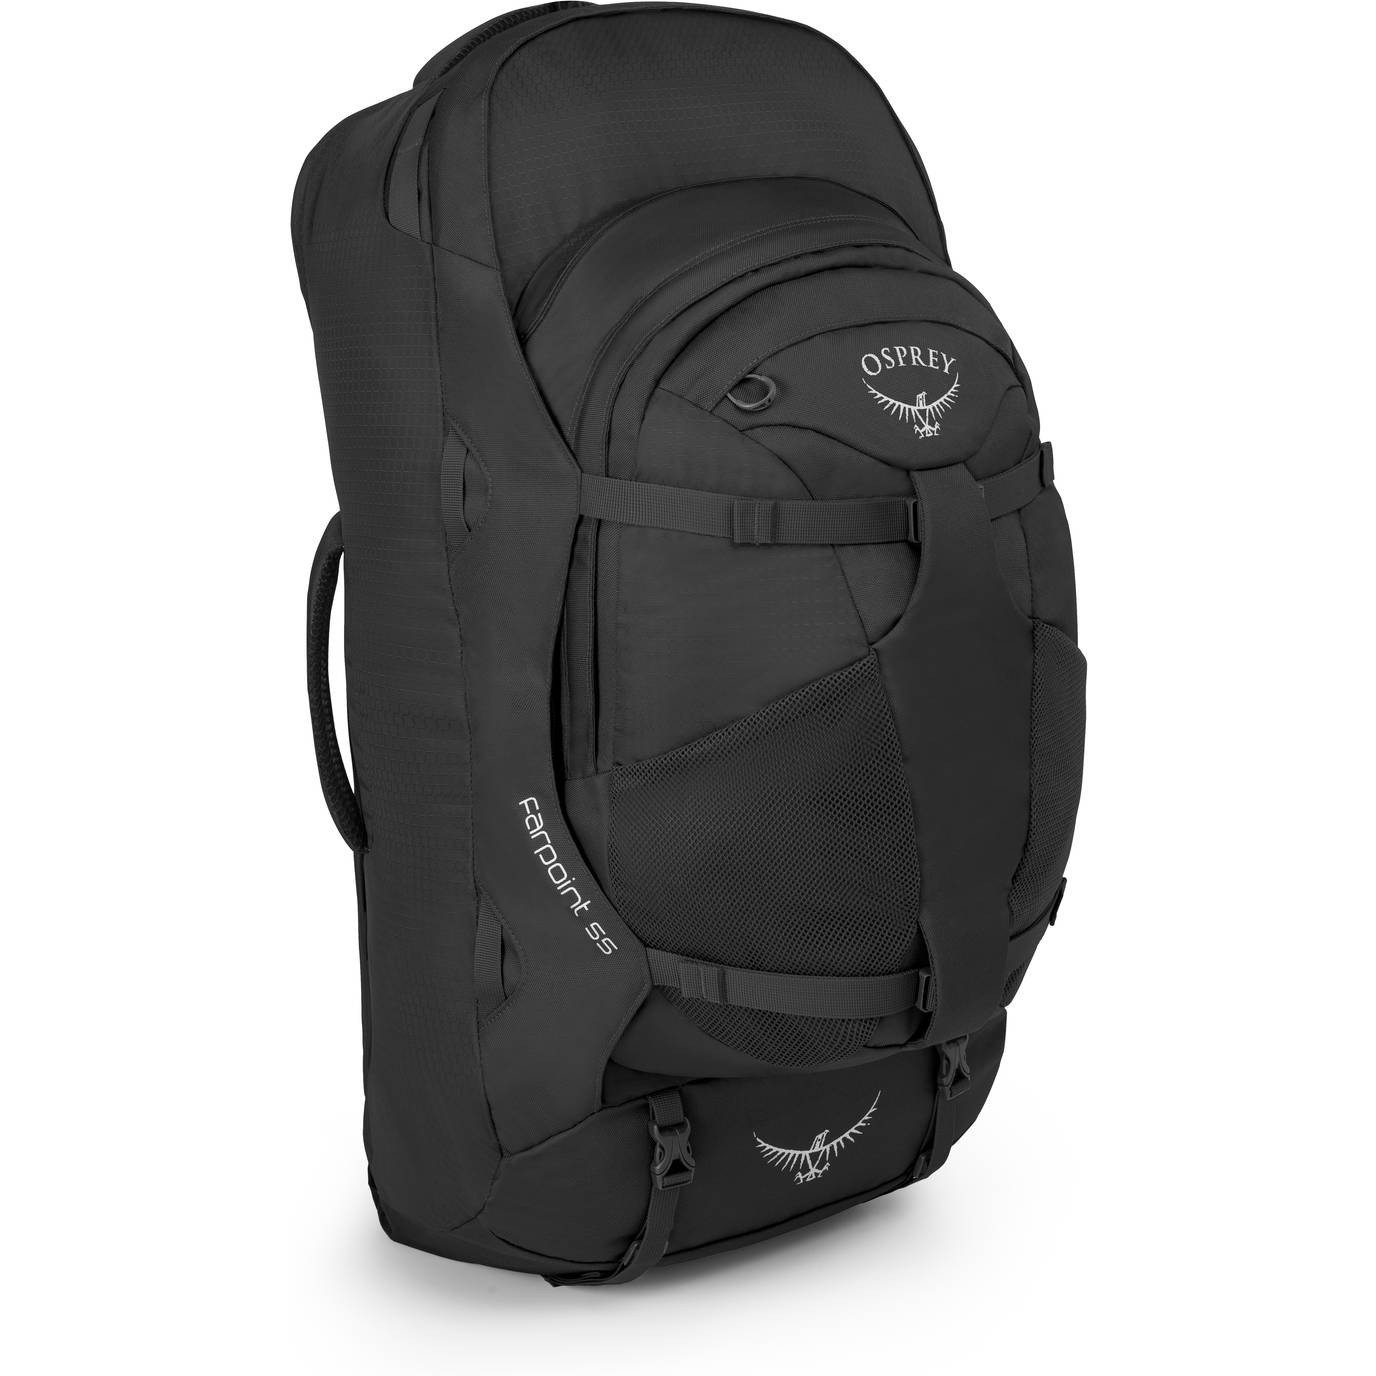 Osprey Packs Farpoint 55 Travel Backpack, Volcanic Grey, Small/Medium